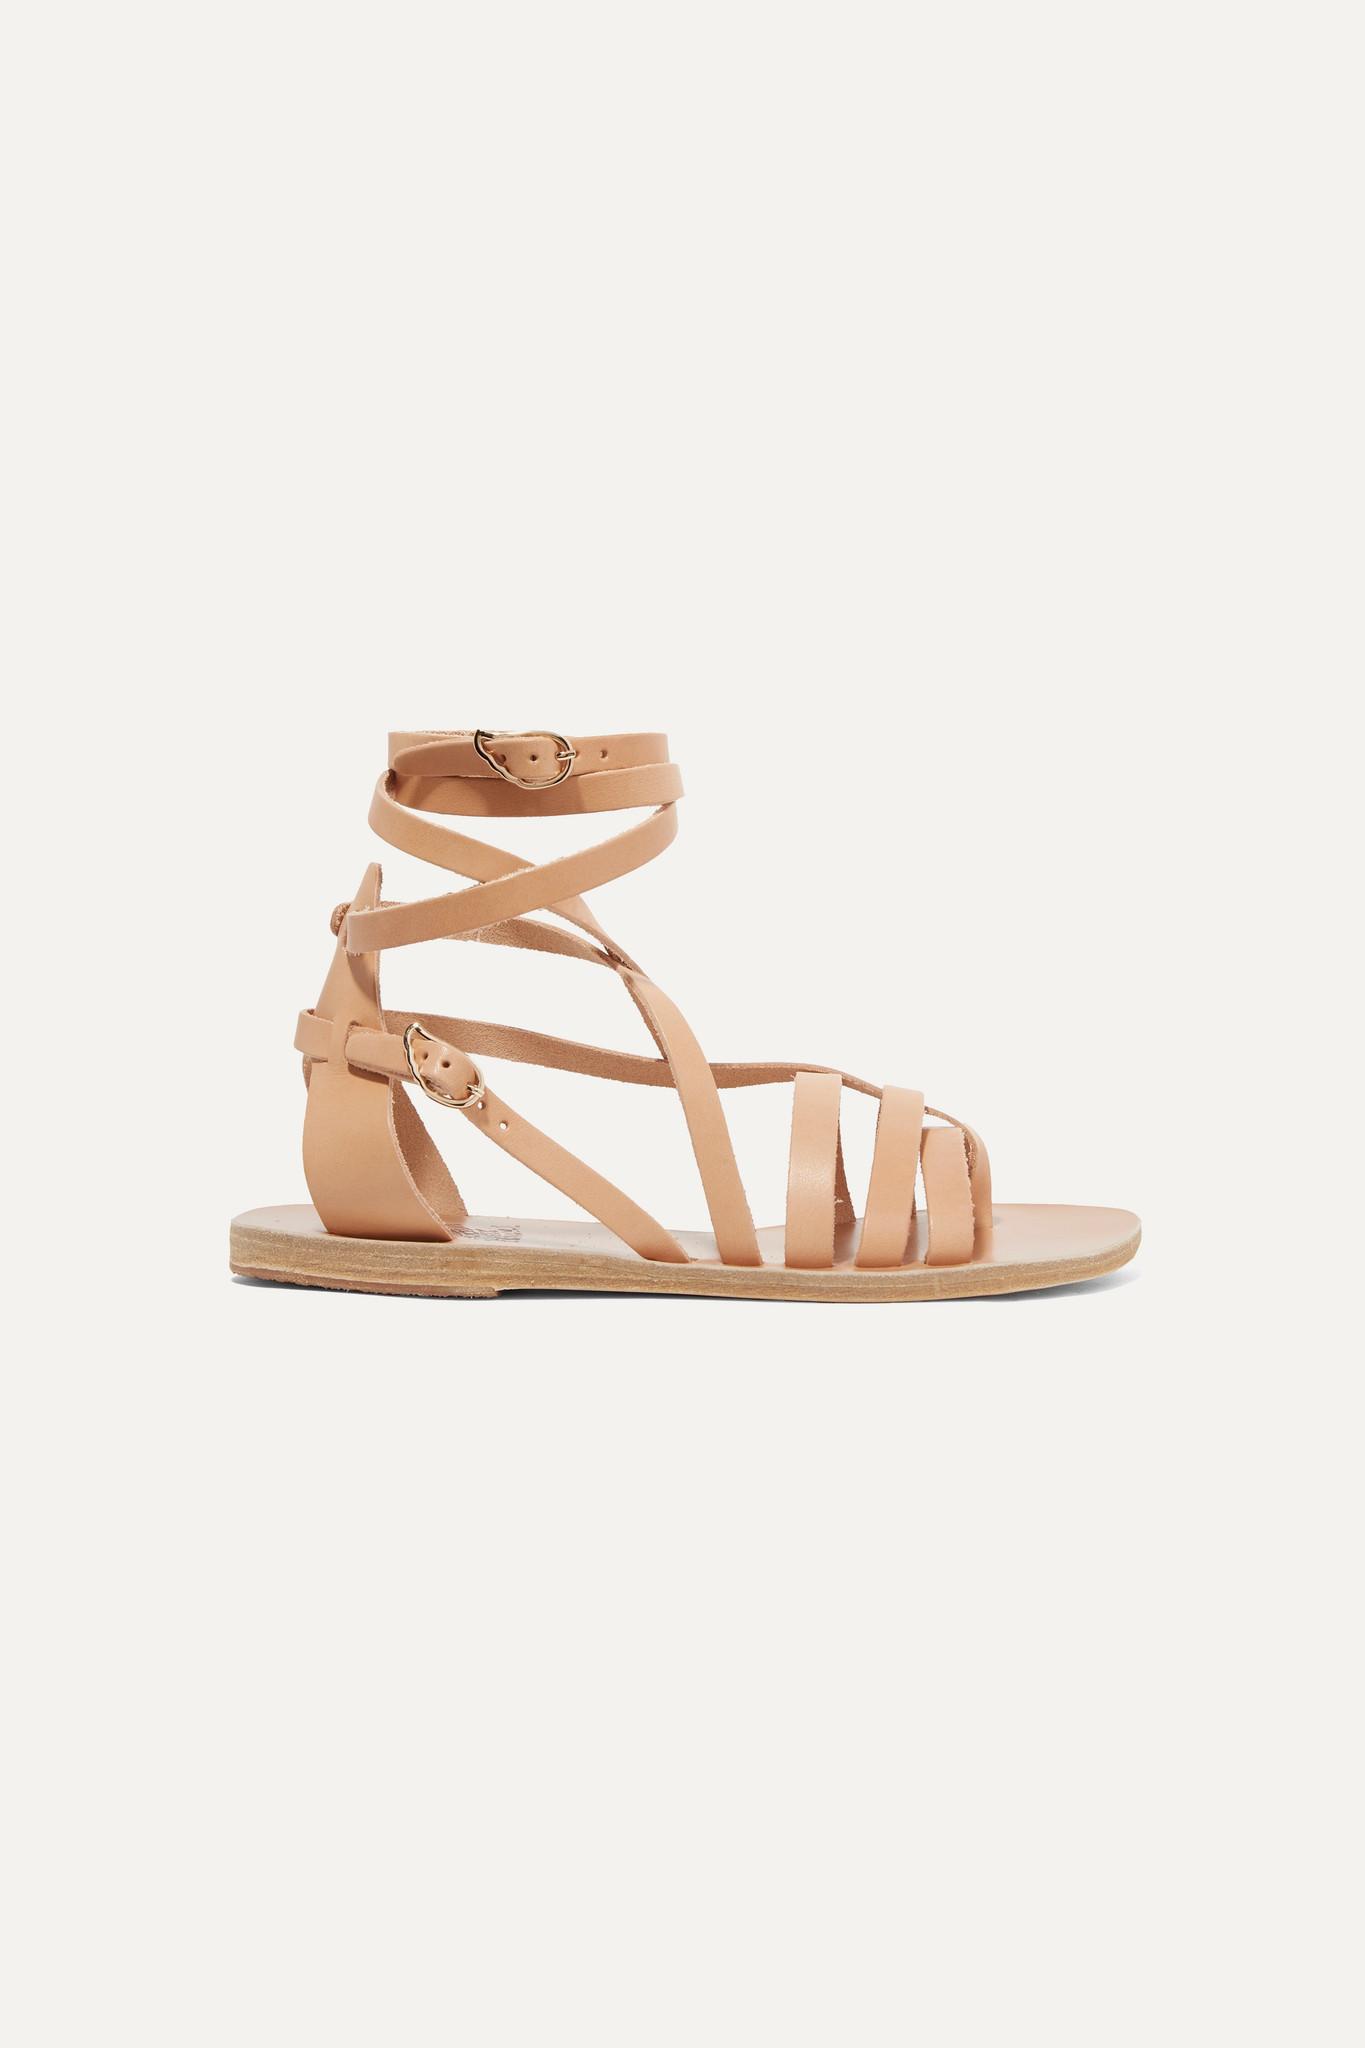 ANCIENT GREEK SANDALS - Satira 皮革凉鞋 - 中性色 - IT36